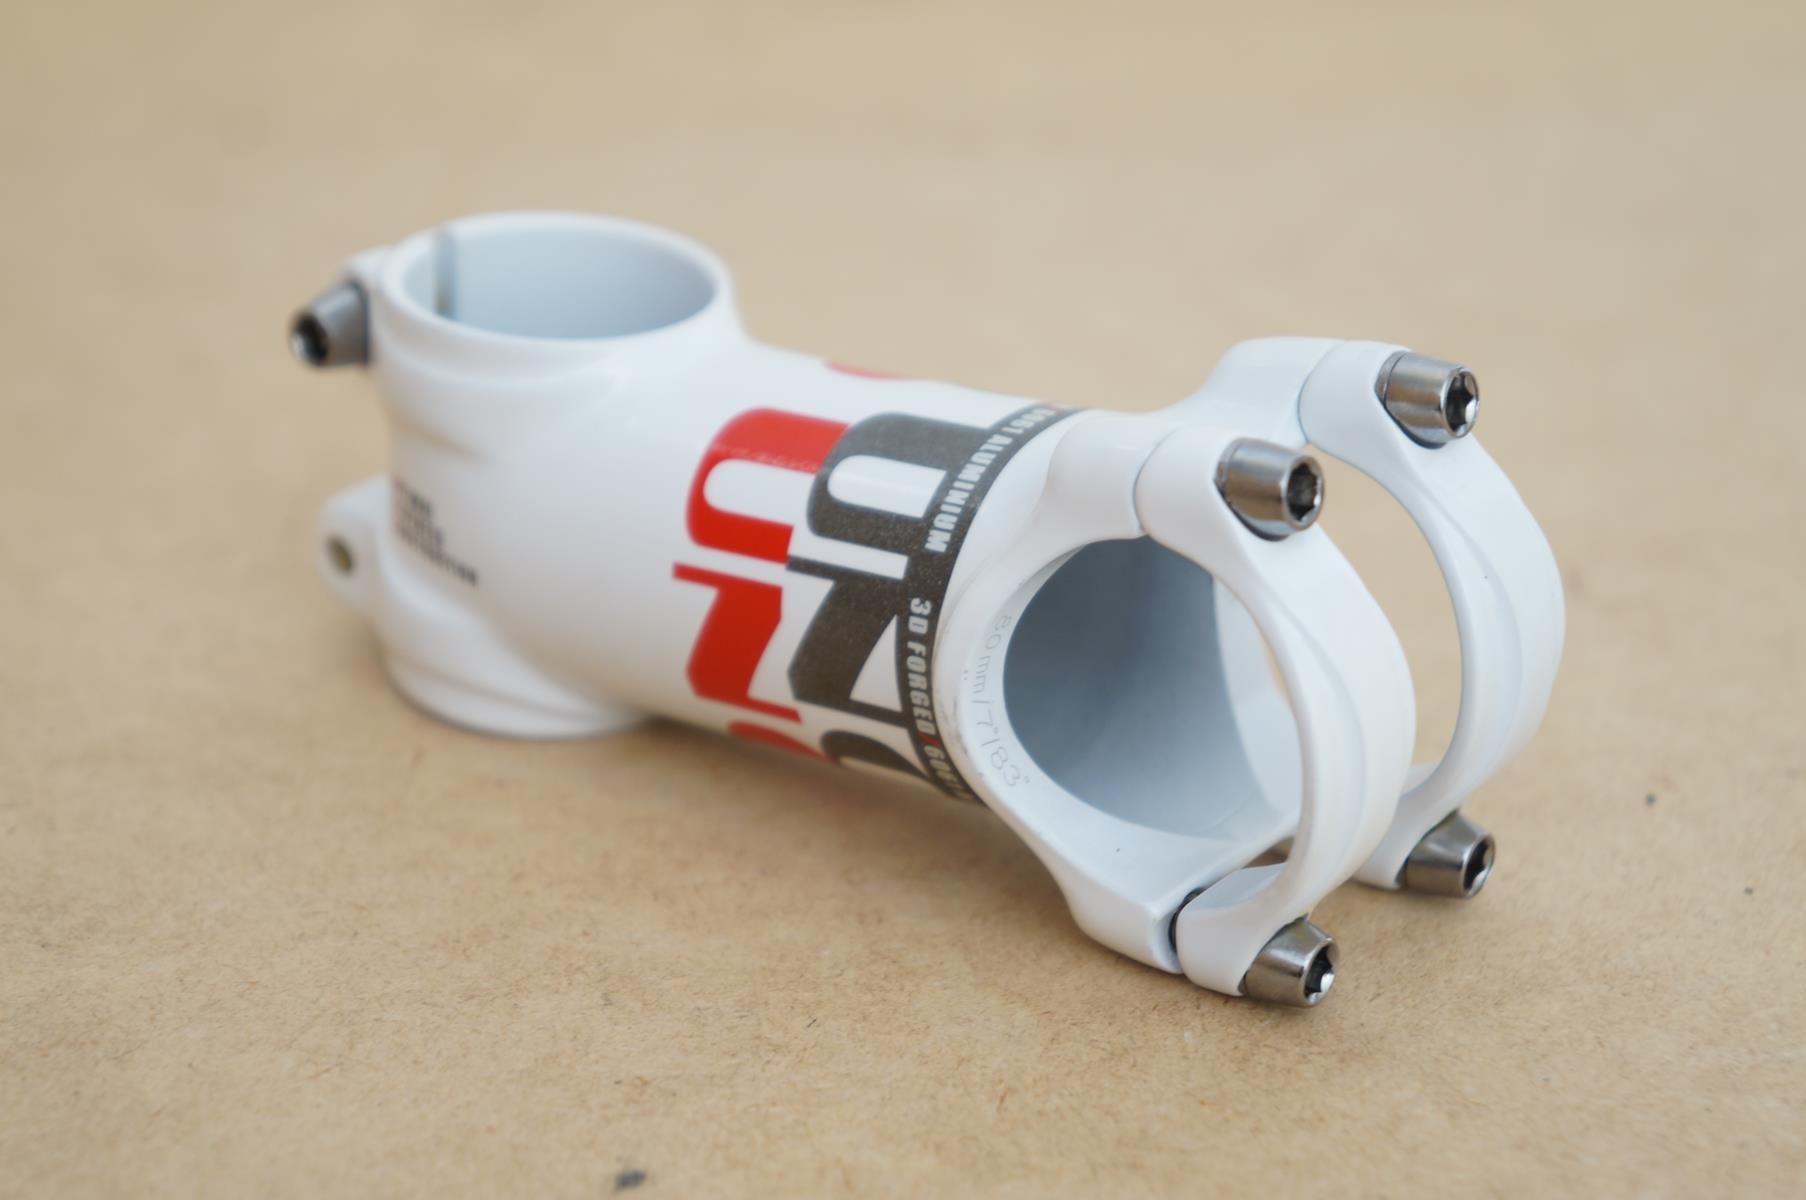 Mesa Bicicleta Mtb Uno AS025 80mm 31.8mm 7º De Inclinação Branca Super leve